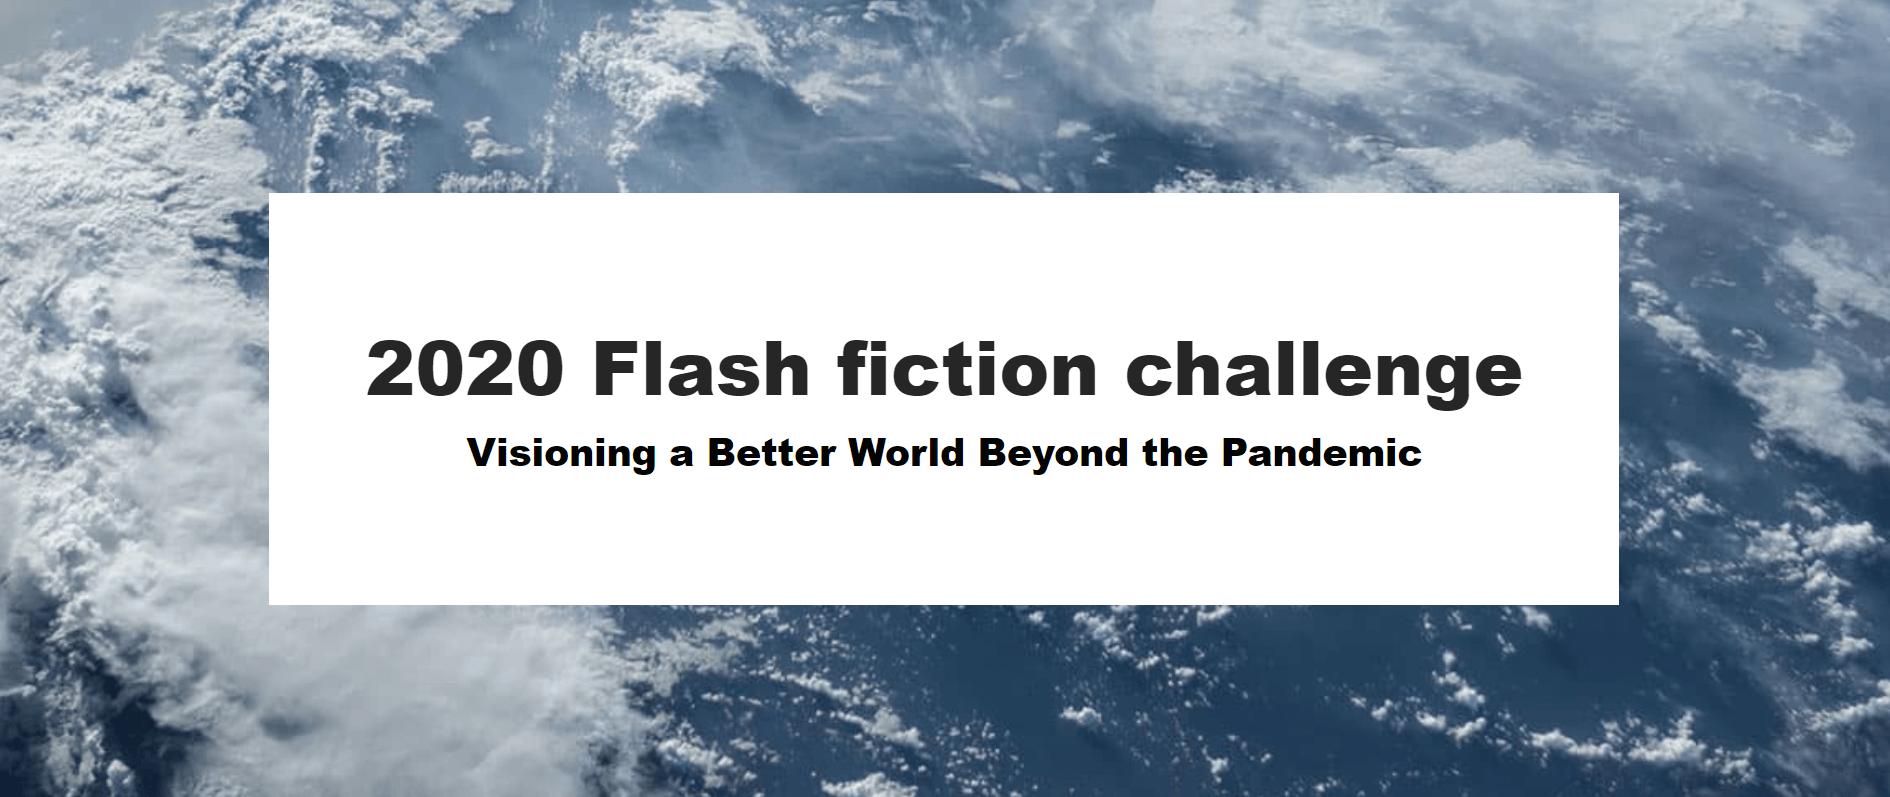 2020 Flash fiction challenge